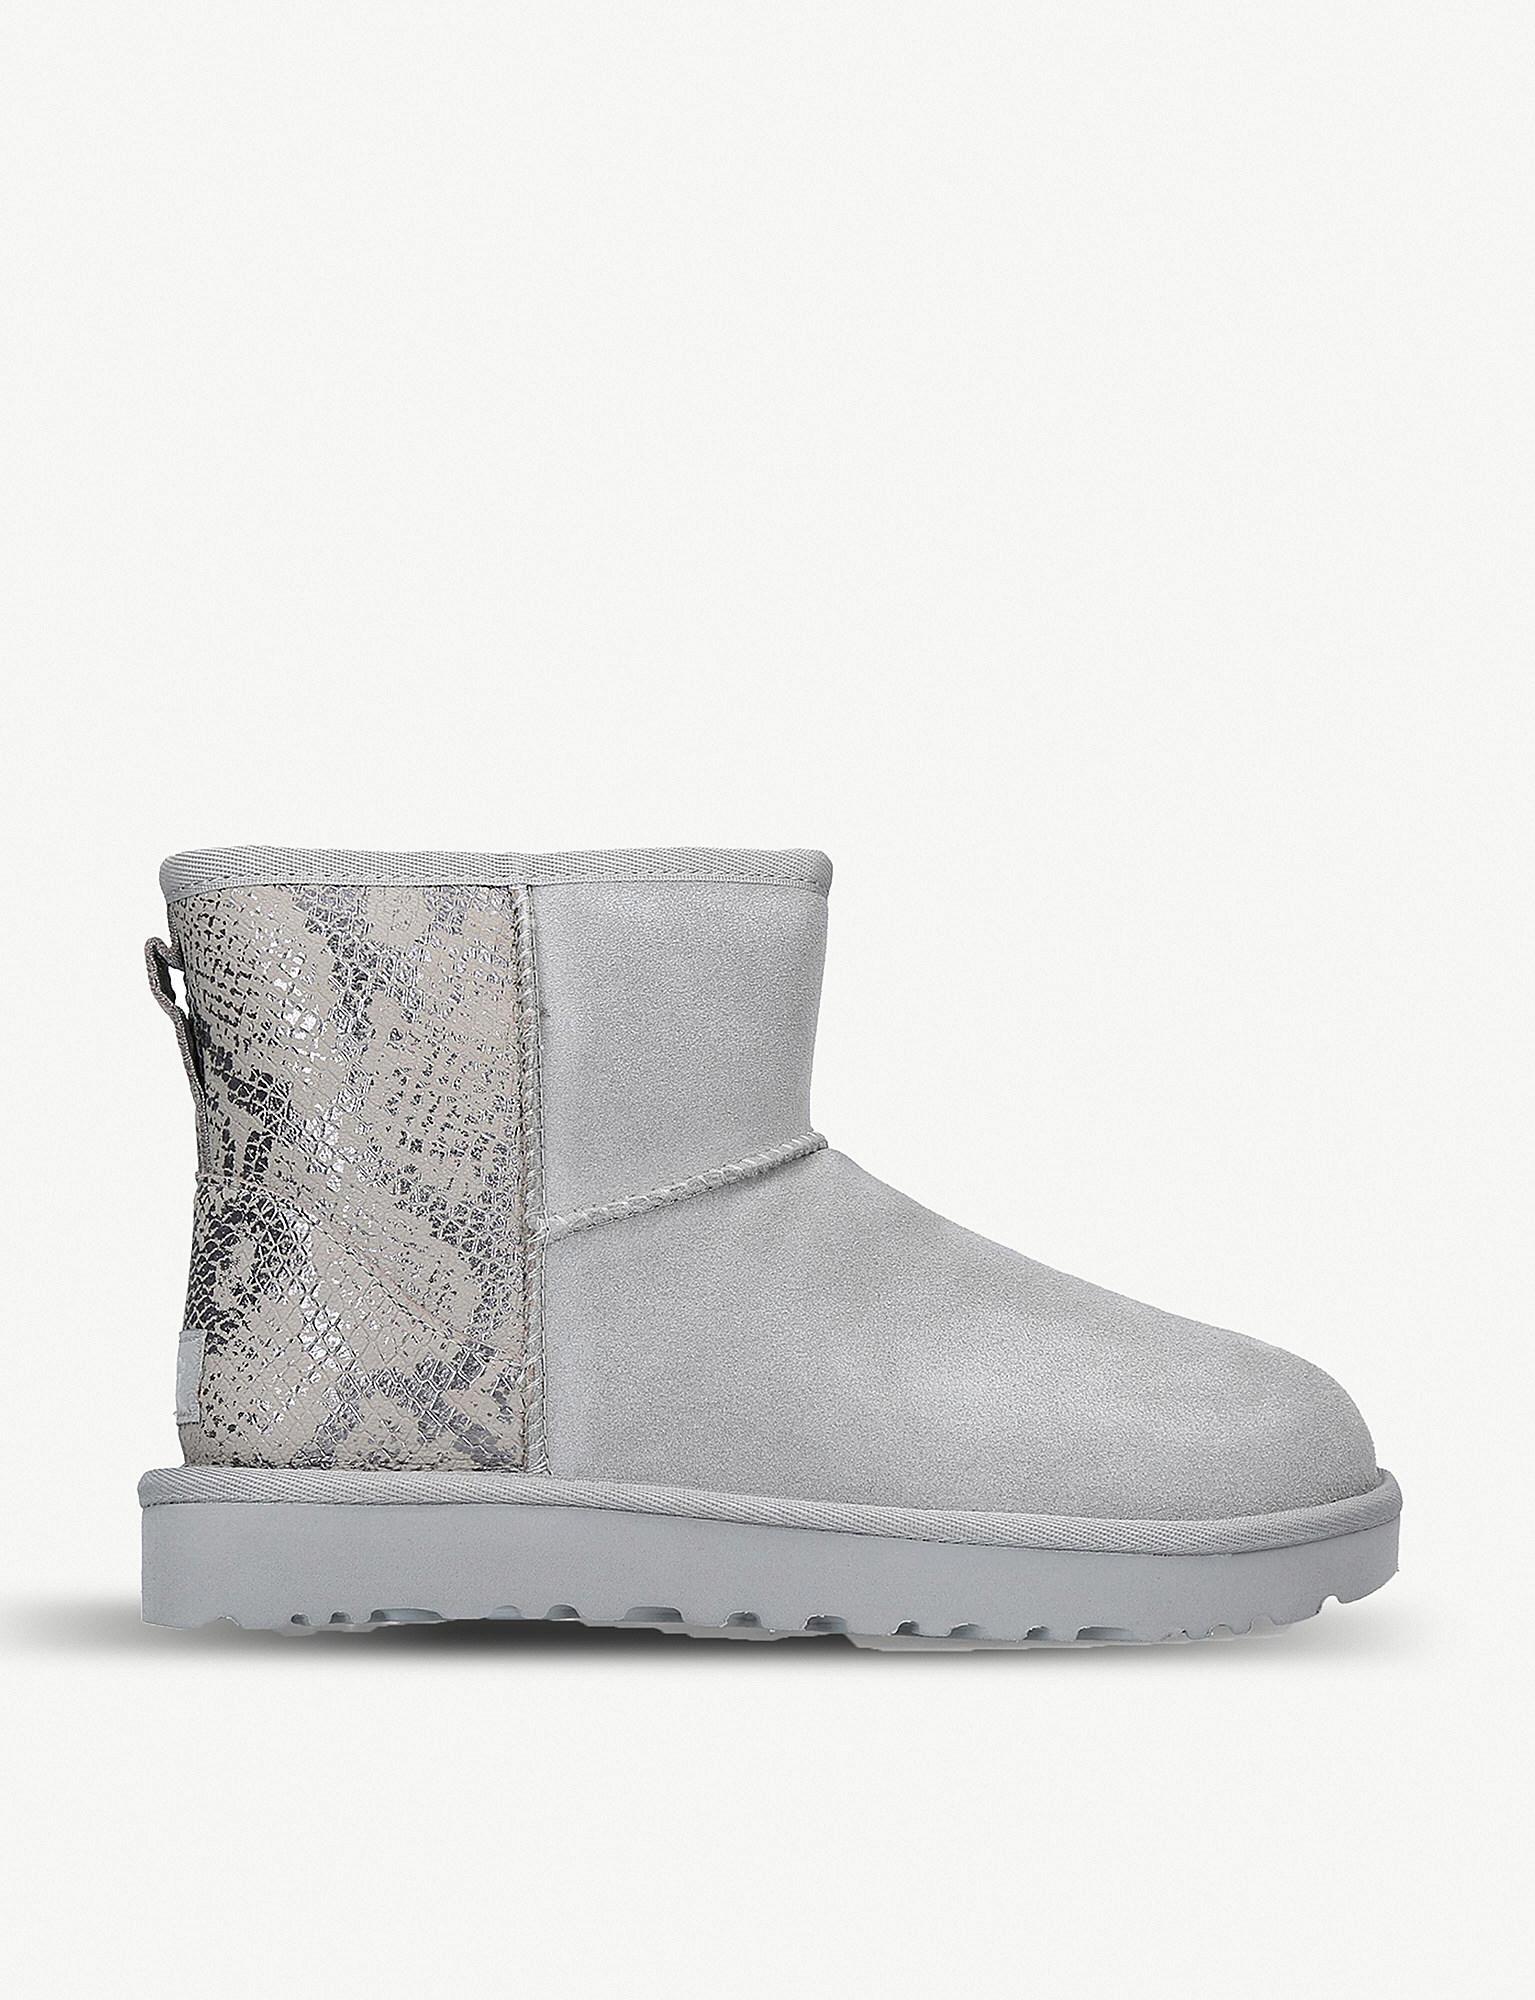 b66f5b9e71c UGG Classic Mini Metallic Snake-print Sheepskin Boots in Metallic - Lyst